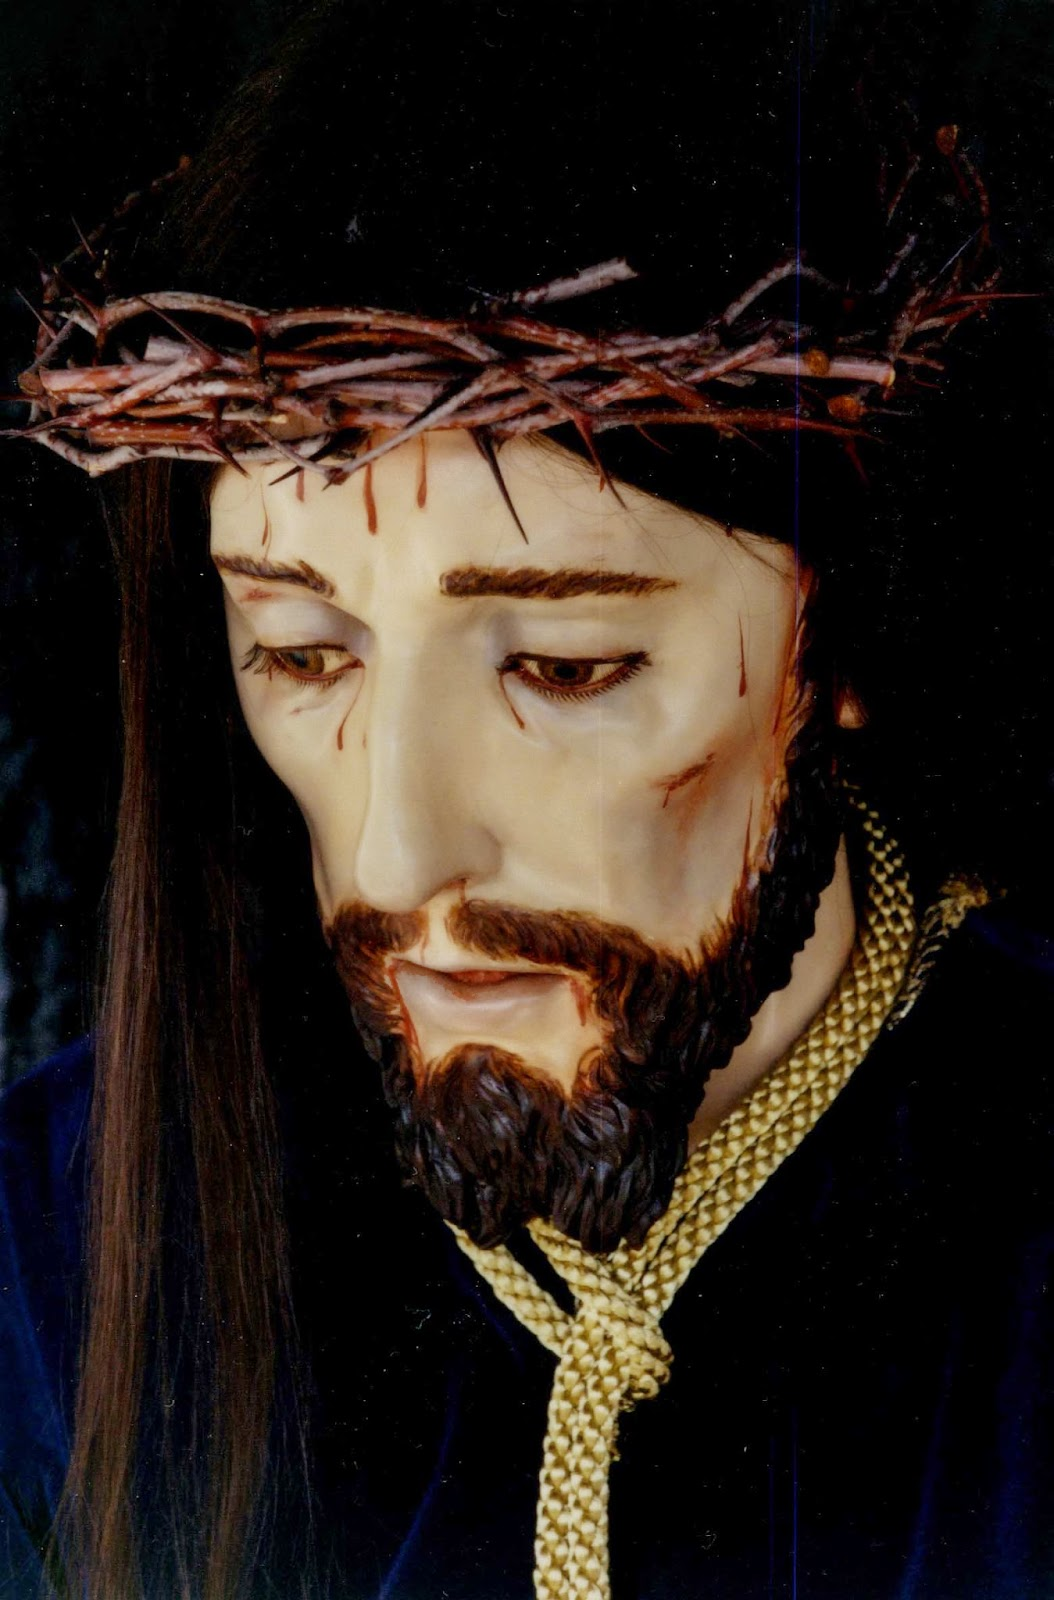 Cristo Misericordia La Algaida Arturo Serra Murcia escultura 3